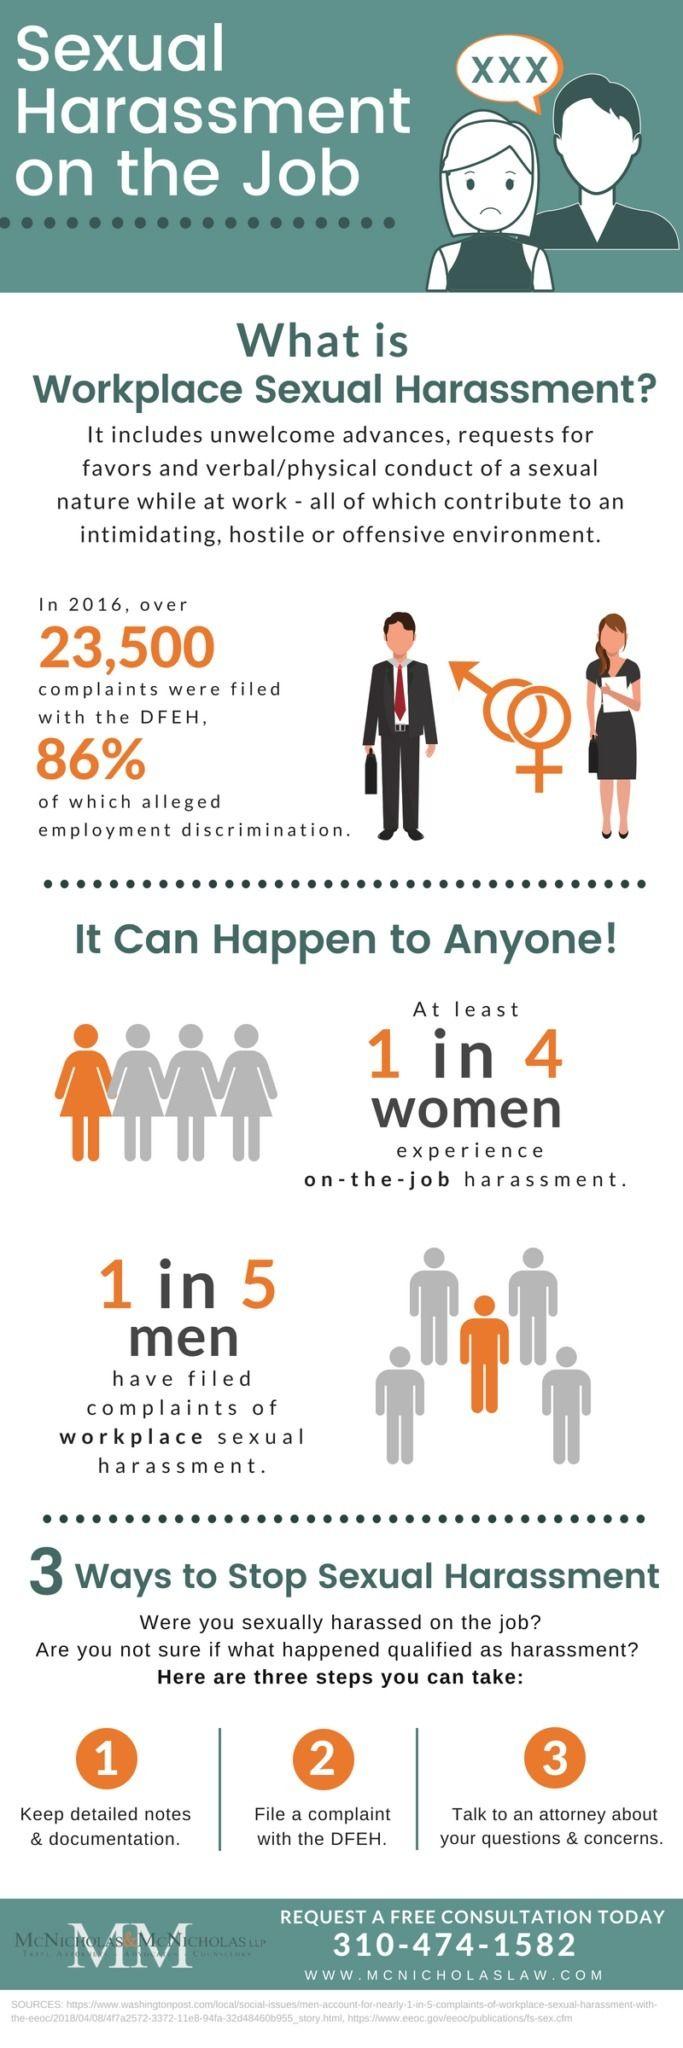 Facts statistics sexual harassm - danchesin | ello